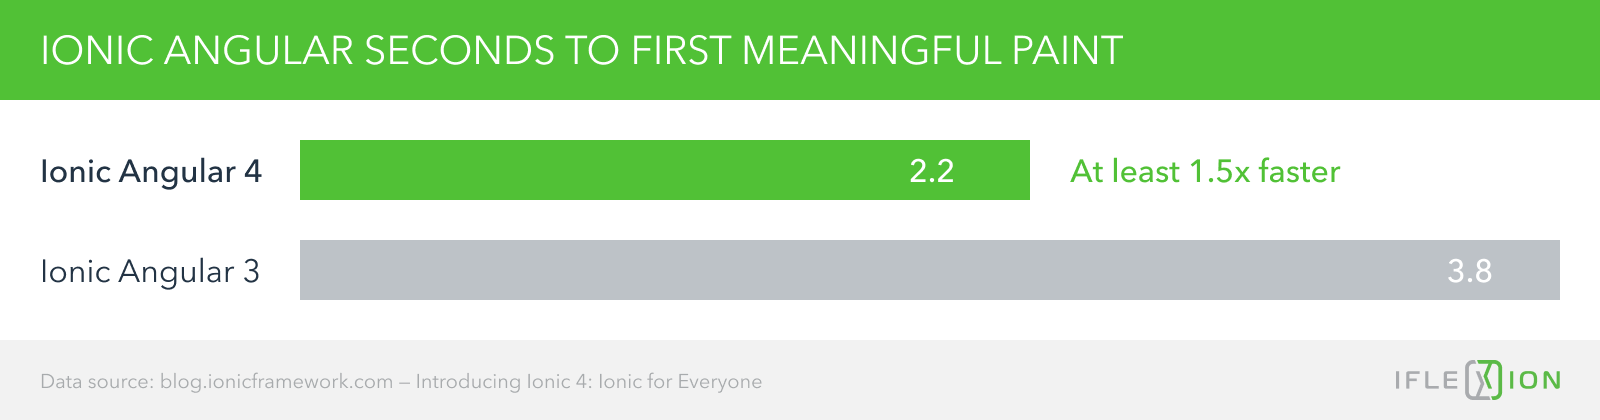 Ionic Angular 3 Angular 4 comparison